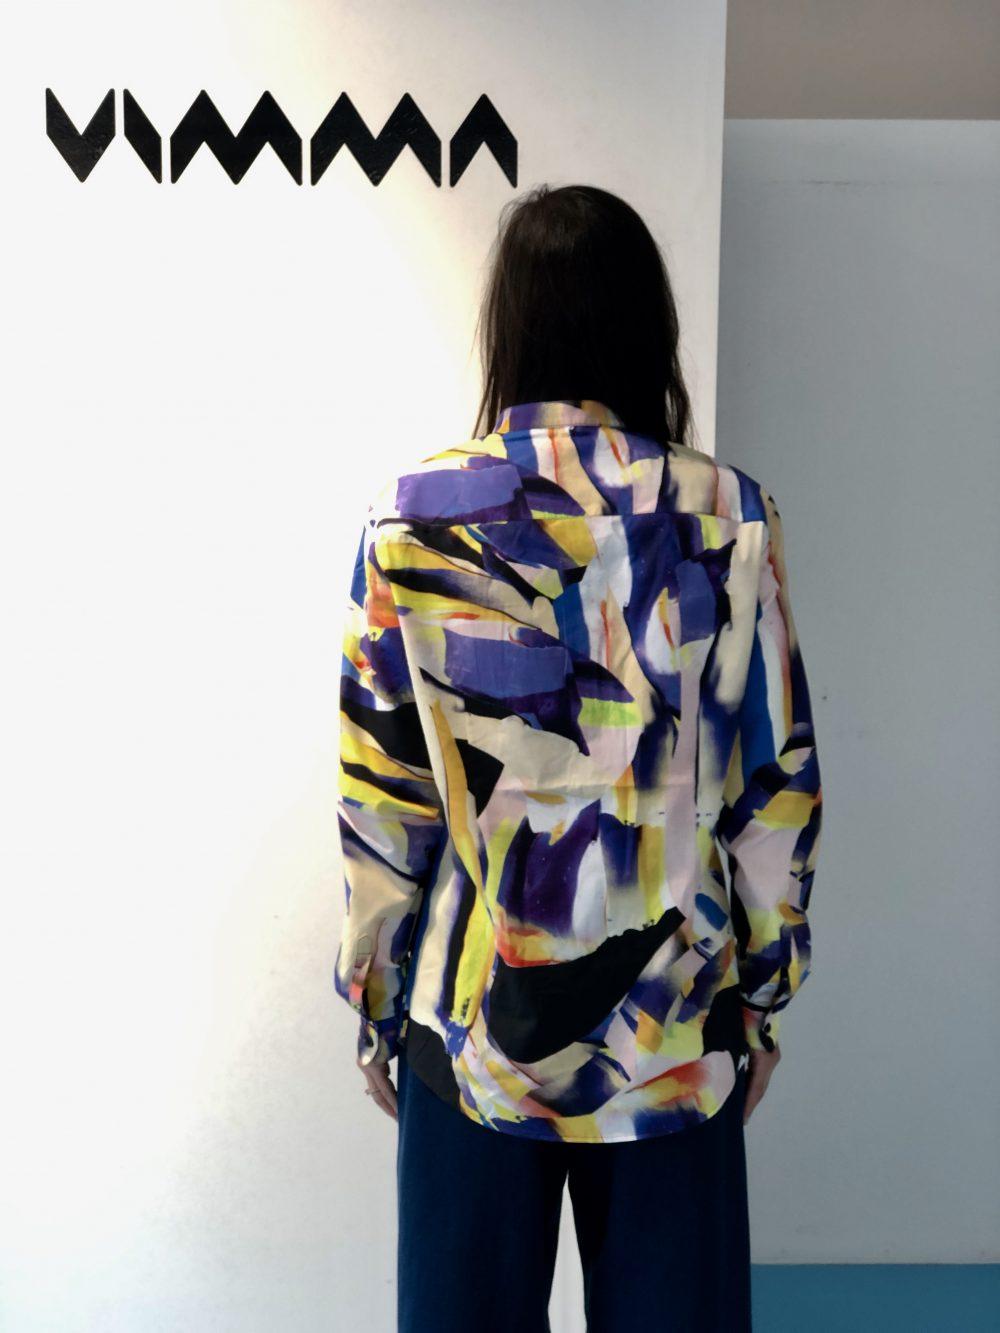 Vimma Shirt ROOPE Riemu colourful XS-L - colourful, riemu, ROOPE, Shirt, XS-L